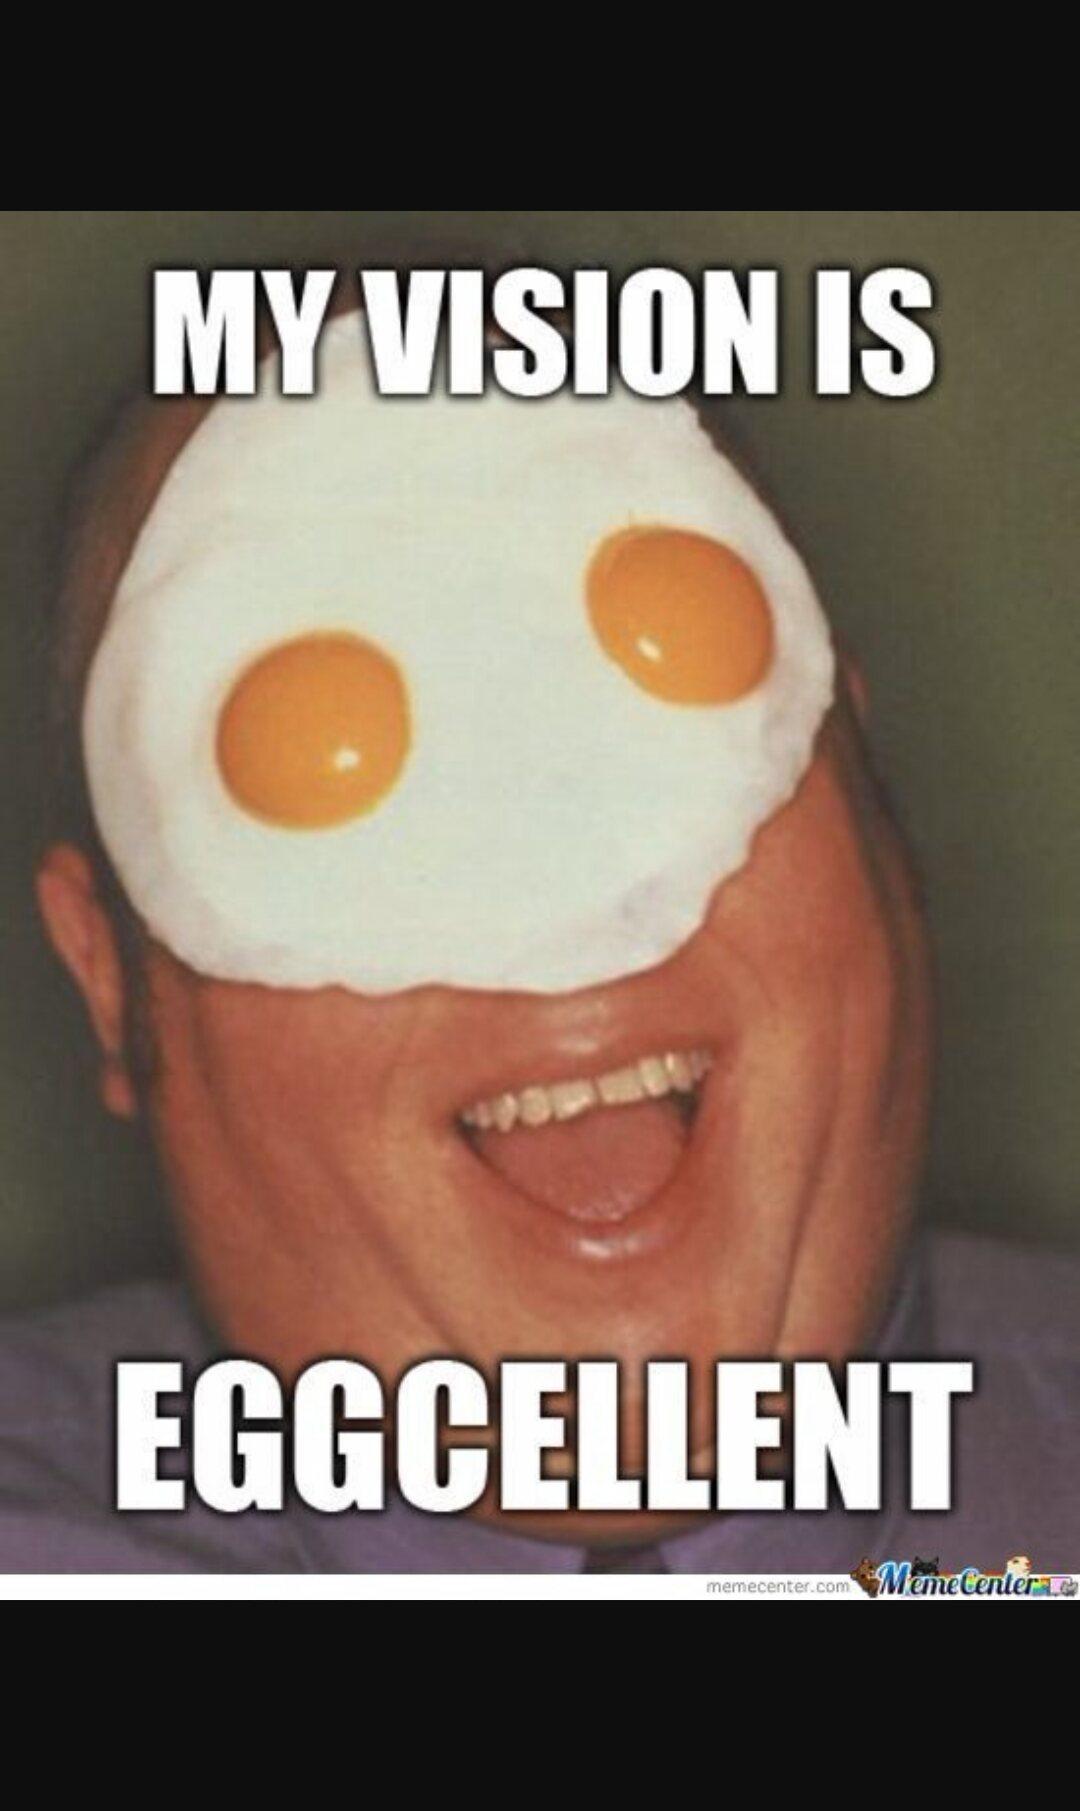 This is an eggcellent joke!